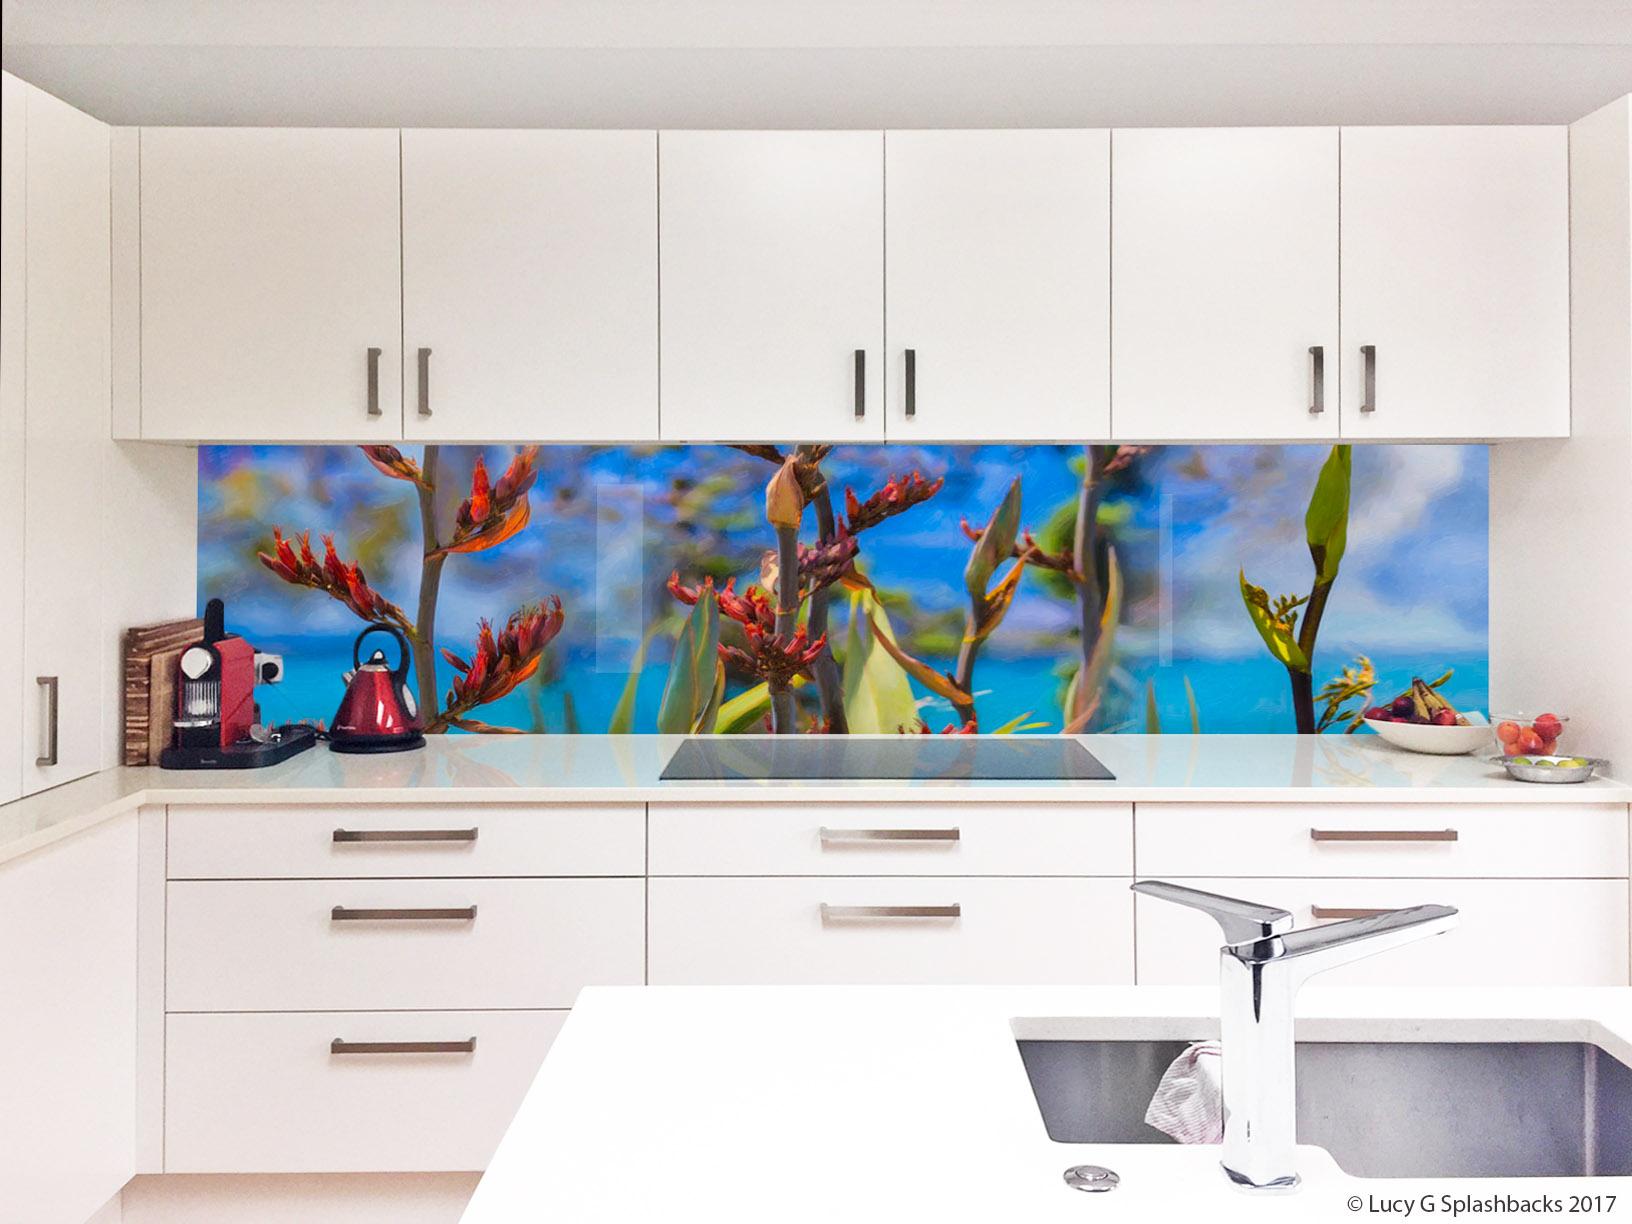 flax-buds-printed-image-splashback-lucy-g.jpg